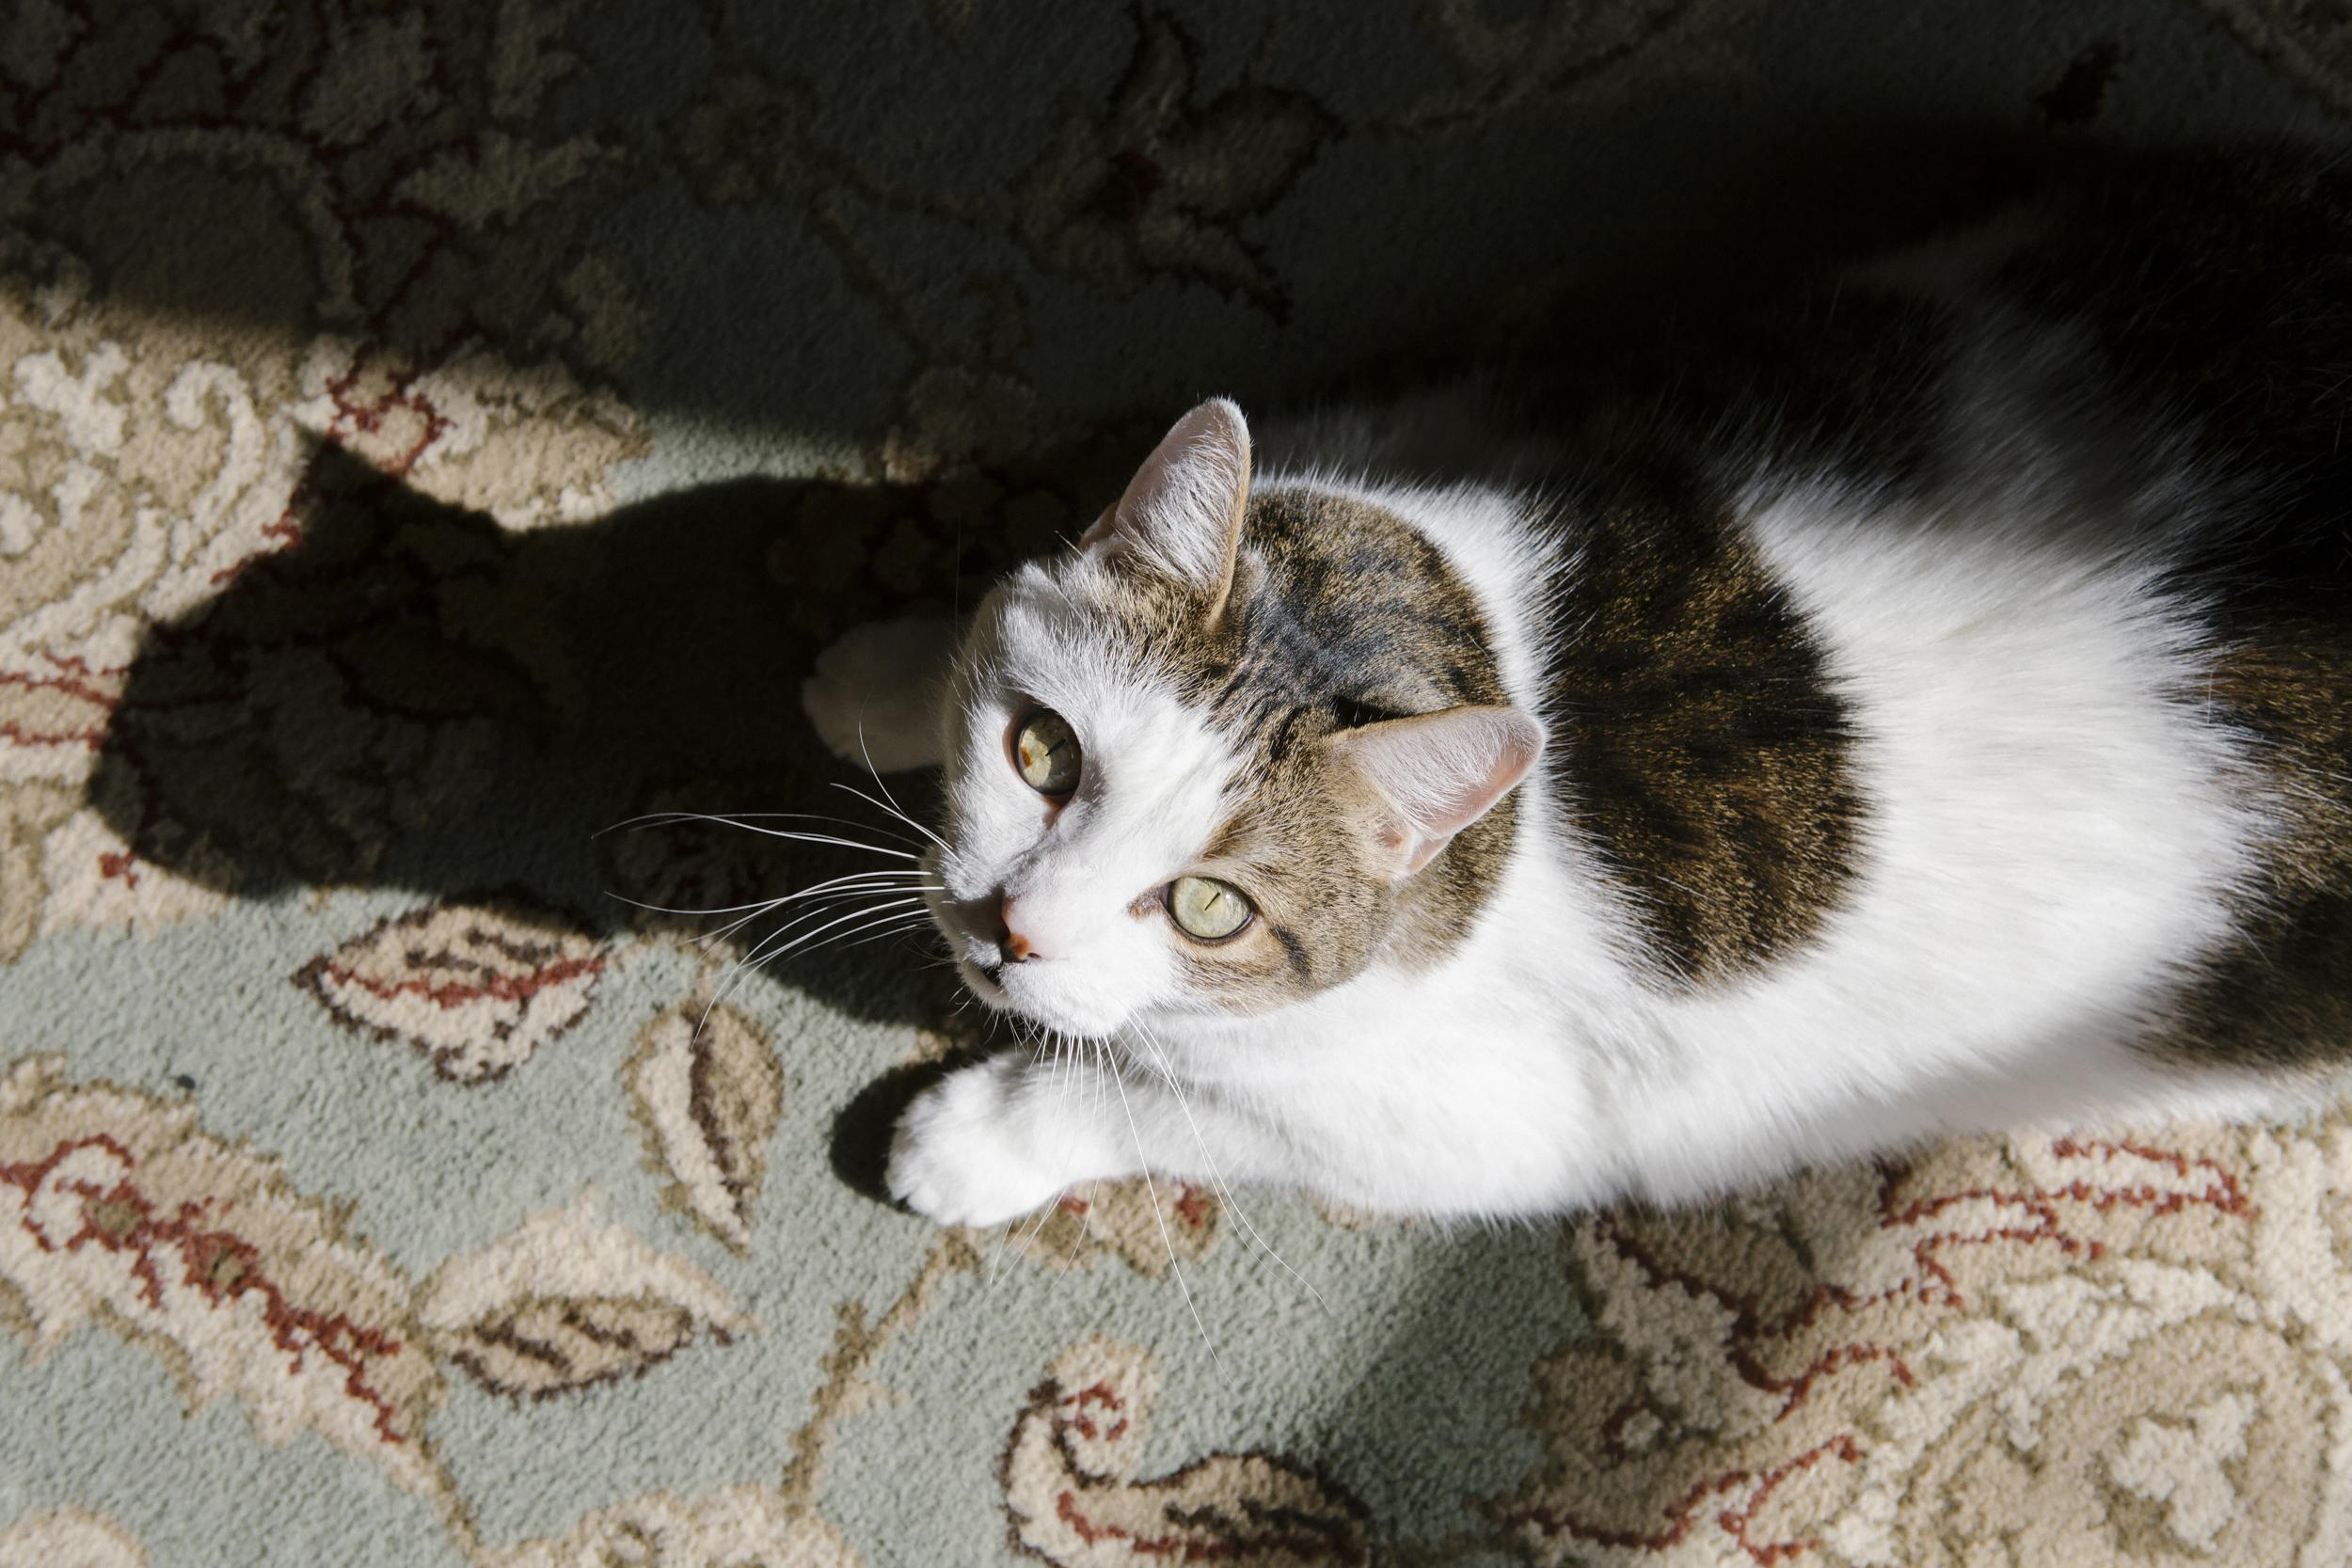 Roxanne's cat Dylan.